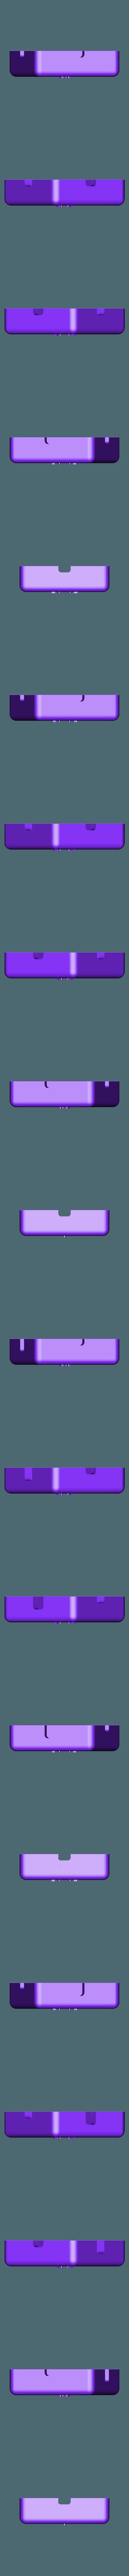 pusher 4.stl Download free STL file Pusher • 3D printer template, itsallinyourhead1